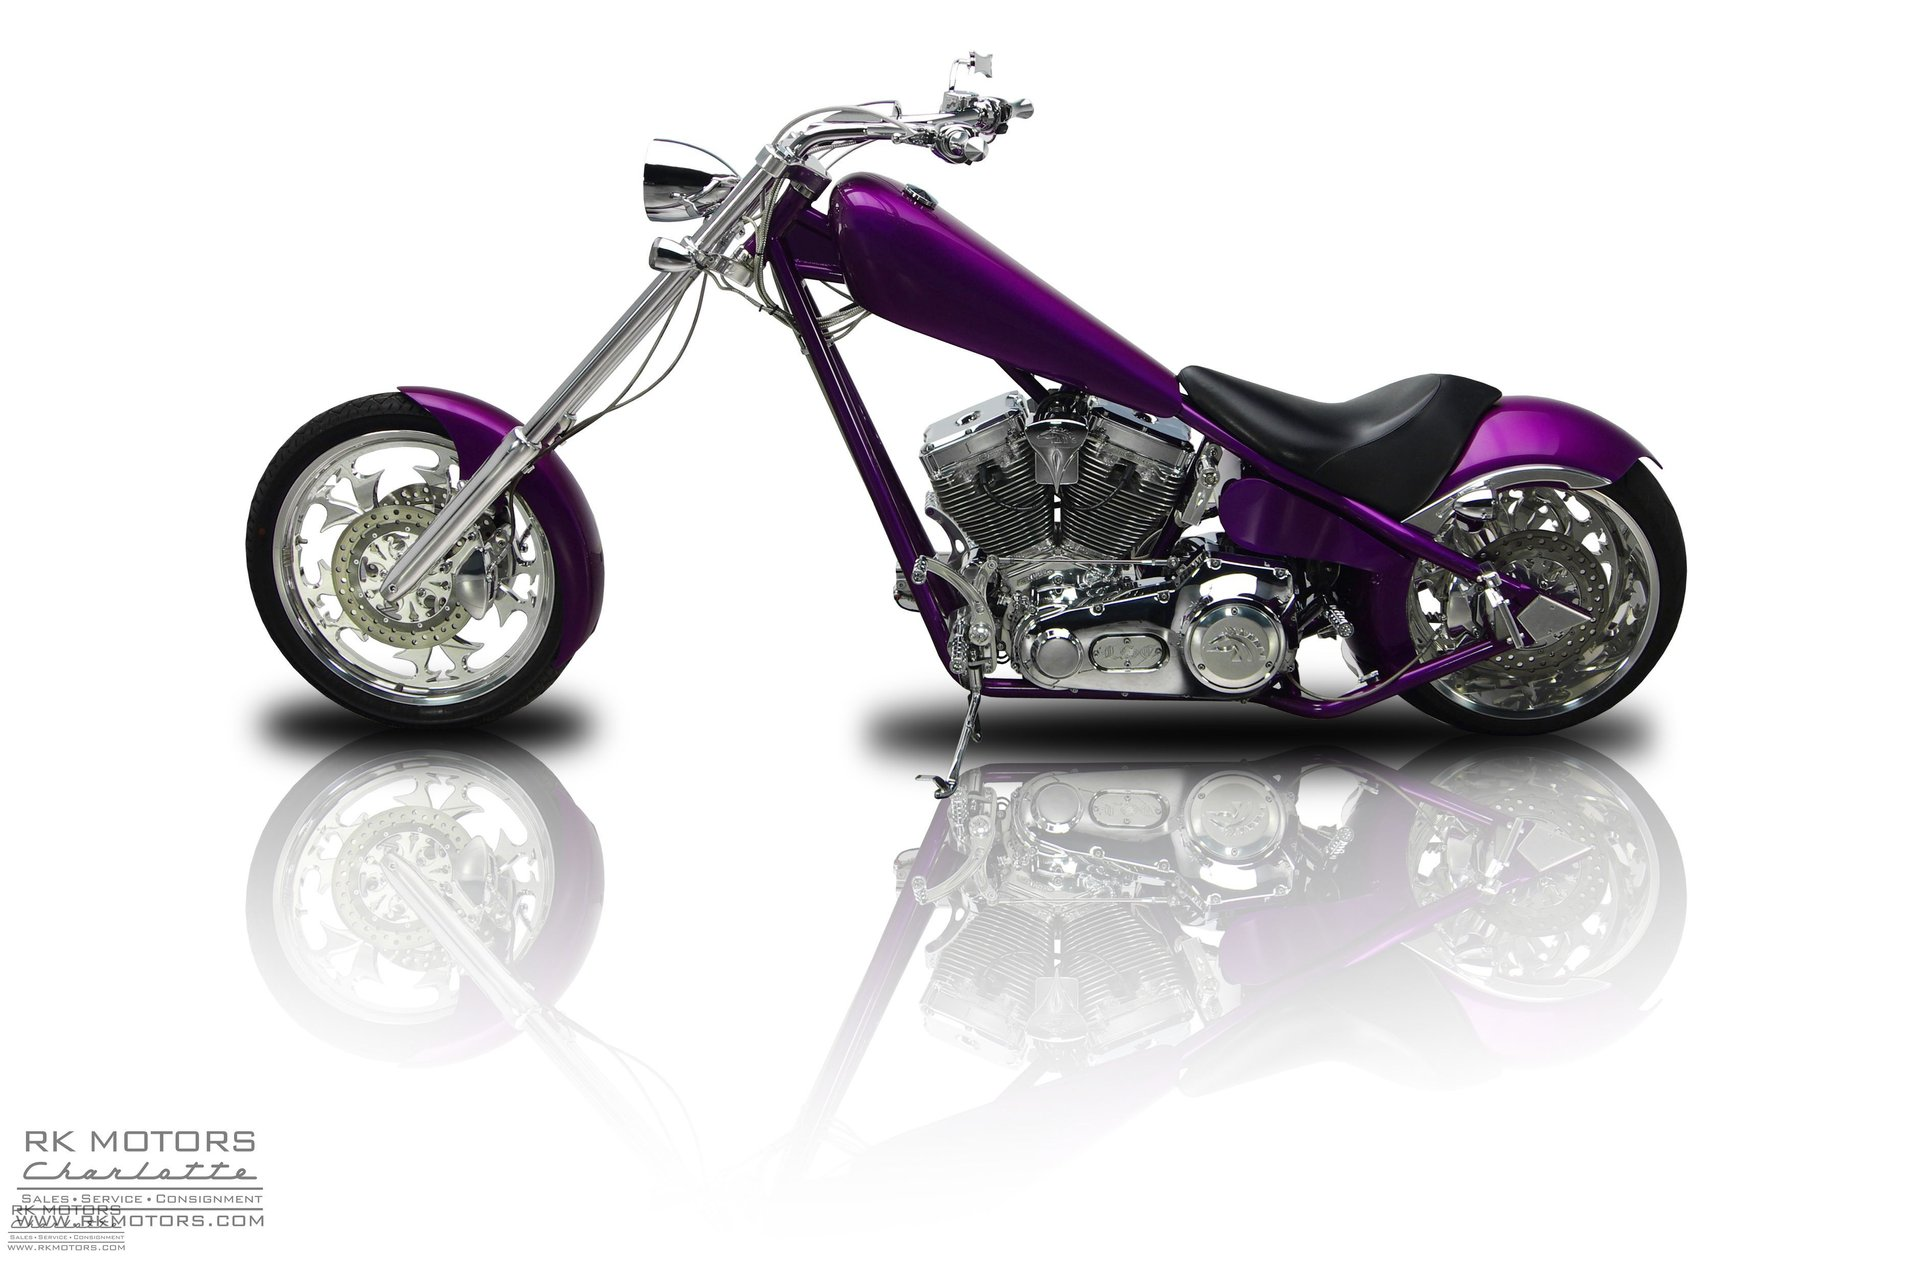 2005 american ironhorse lsc